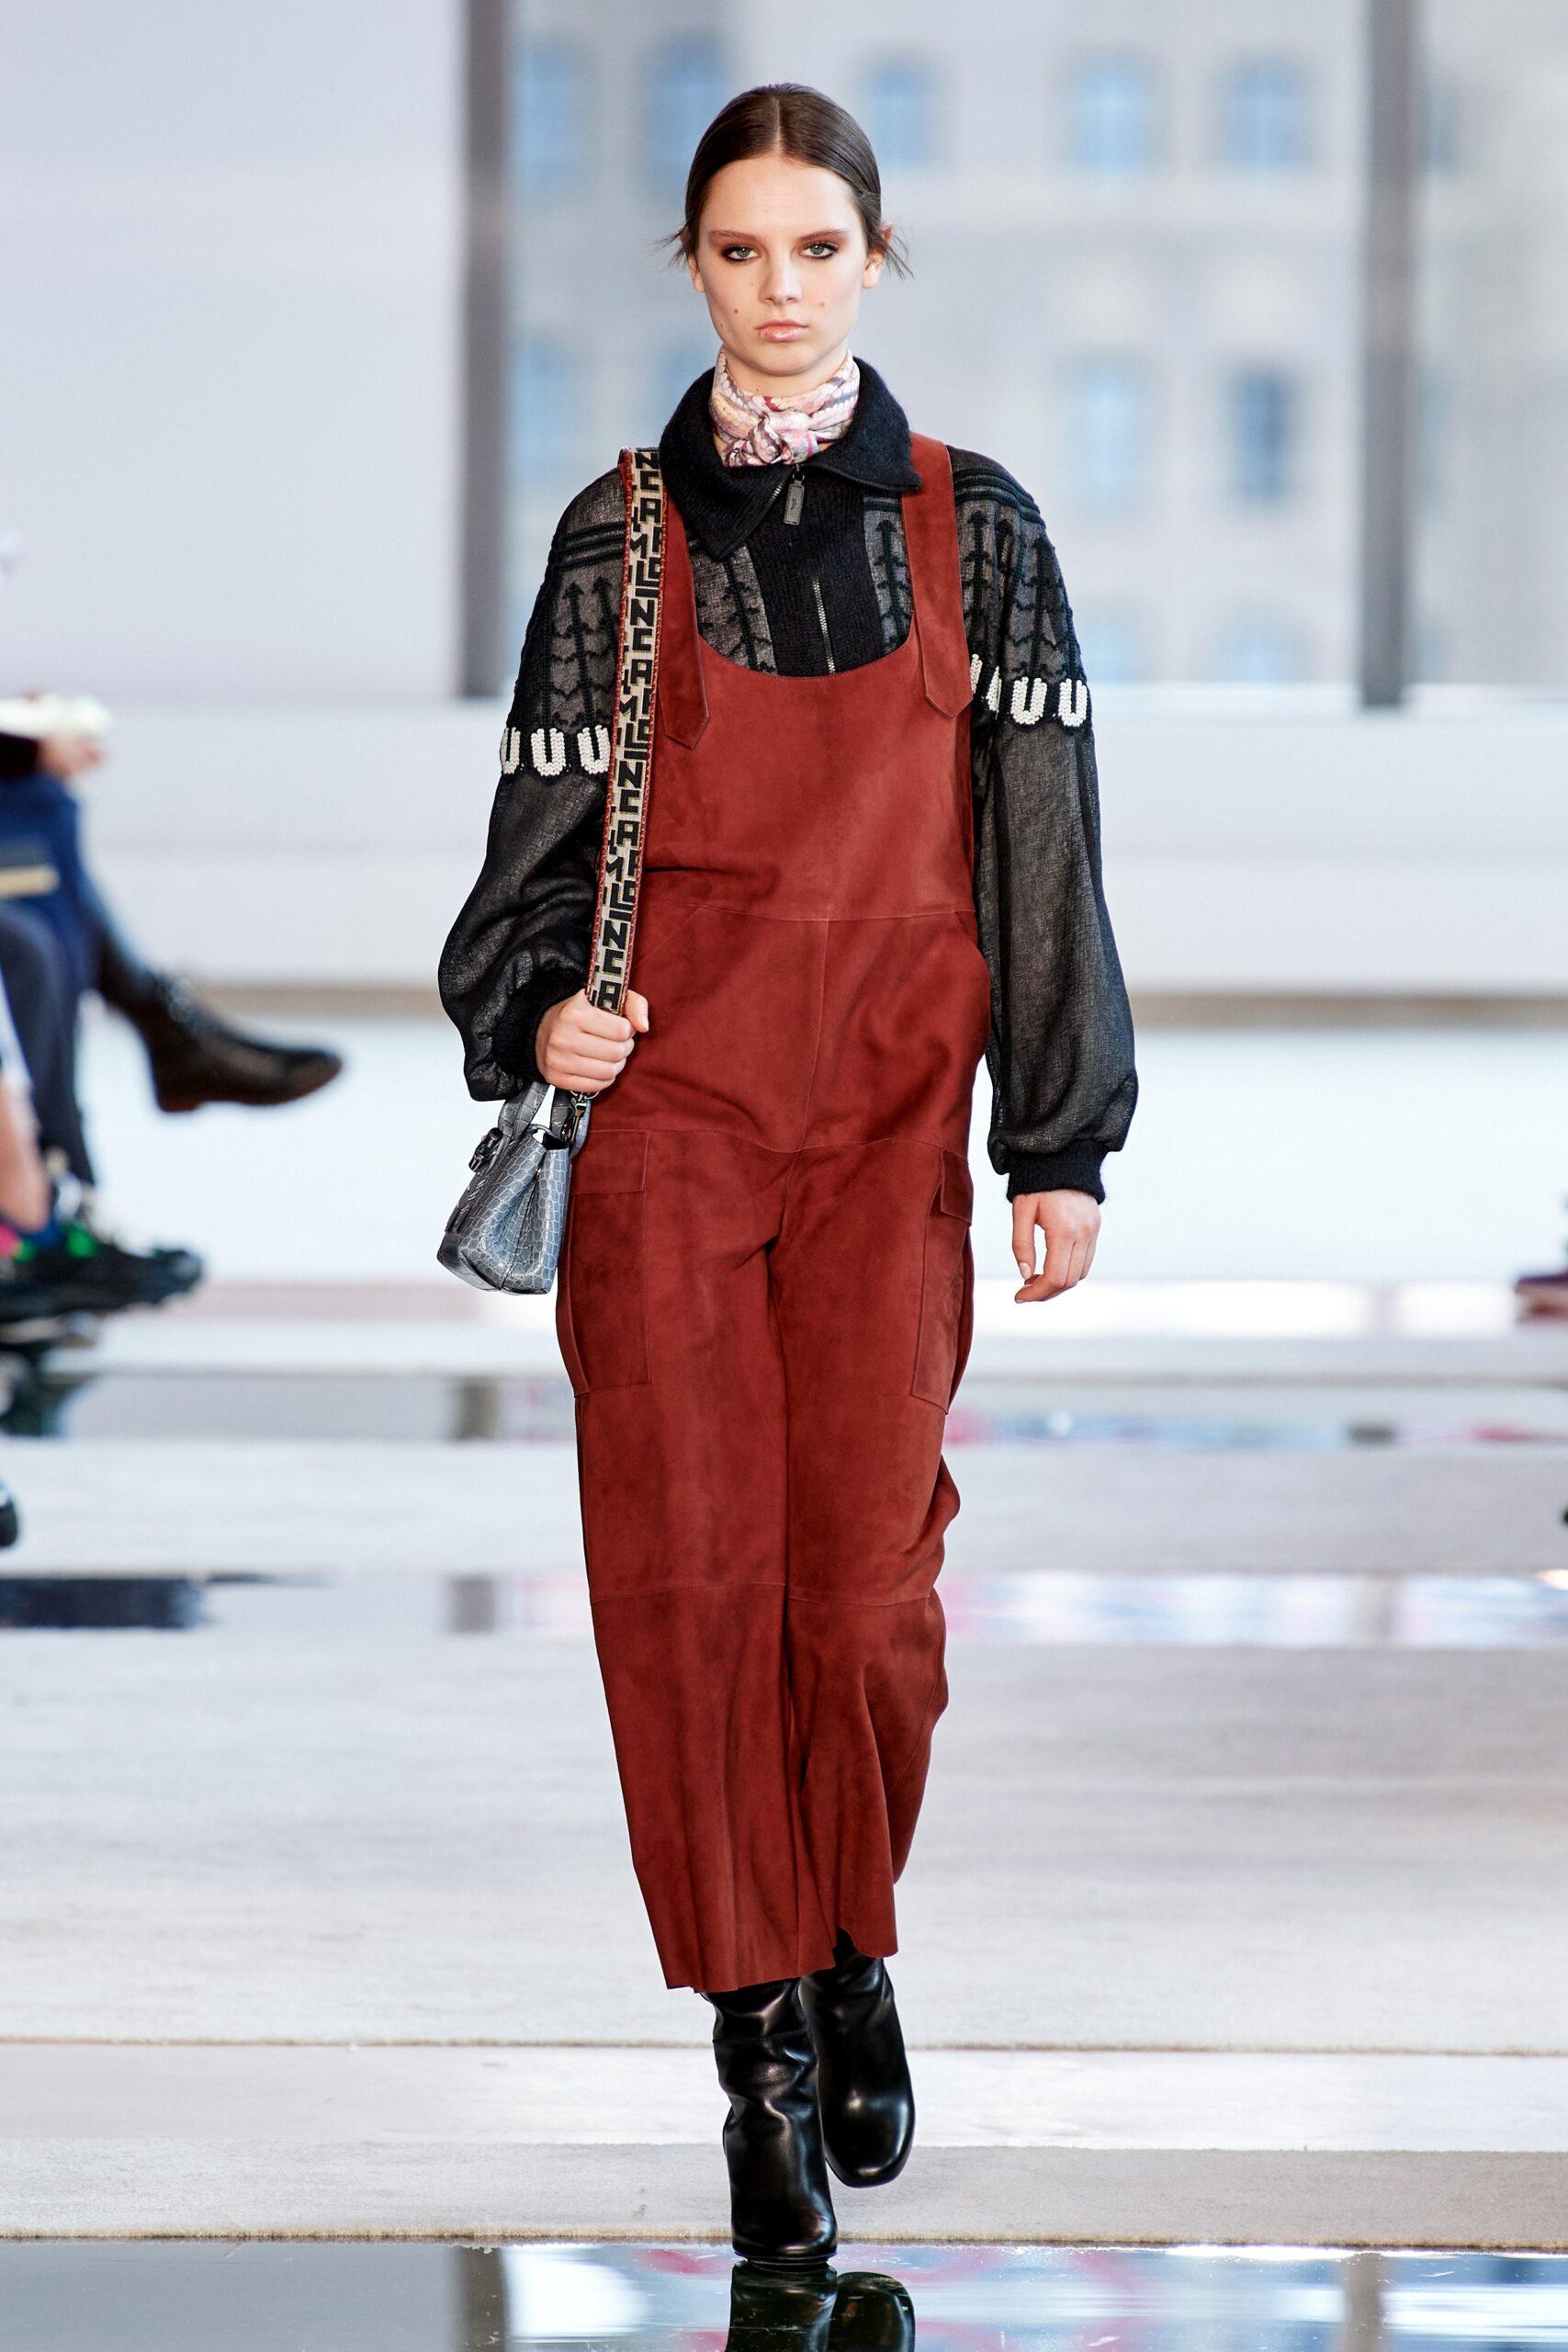 Longchamp Fall 2020 ready-to-wear